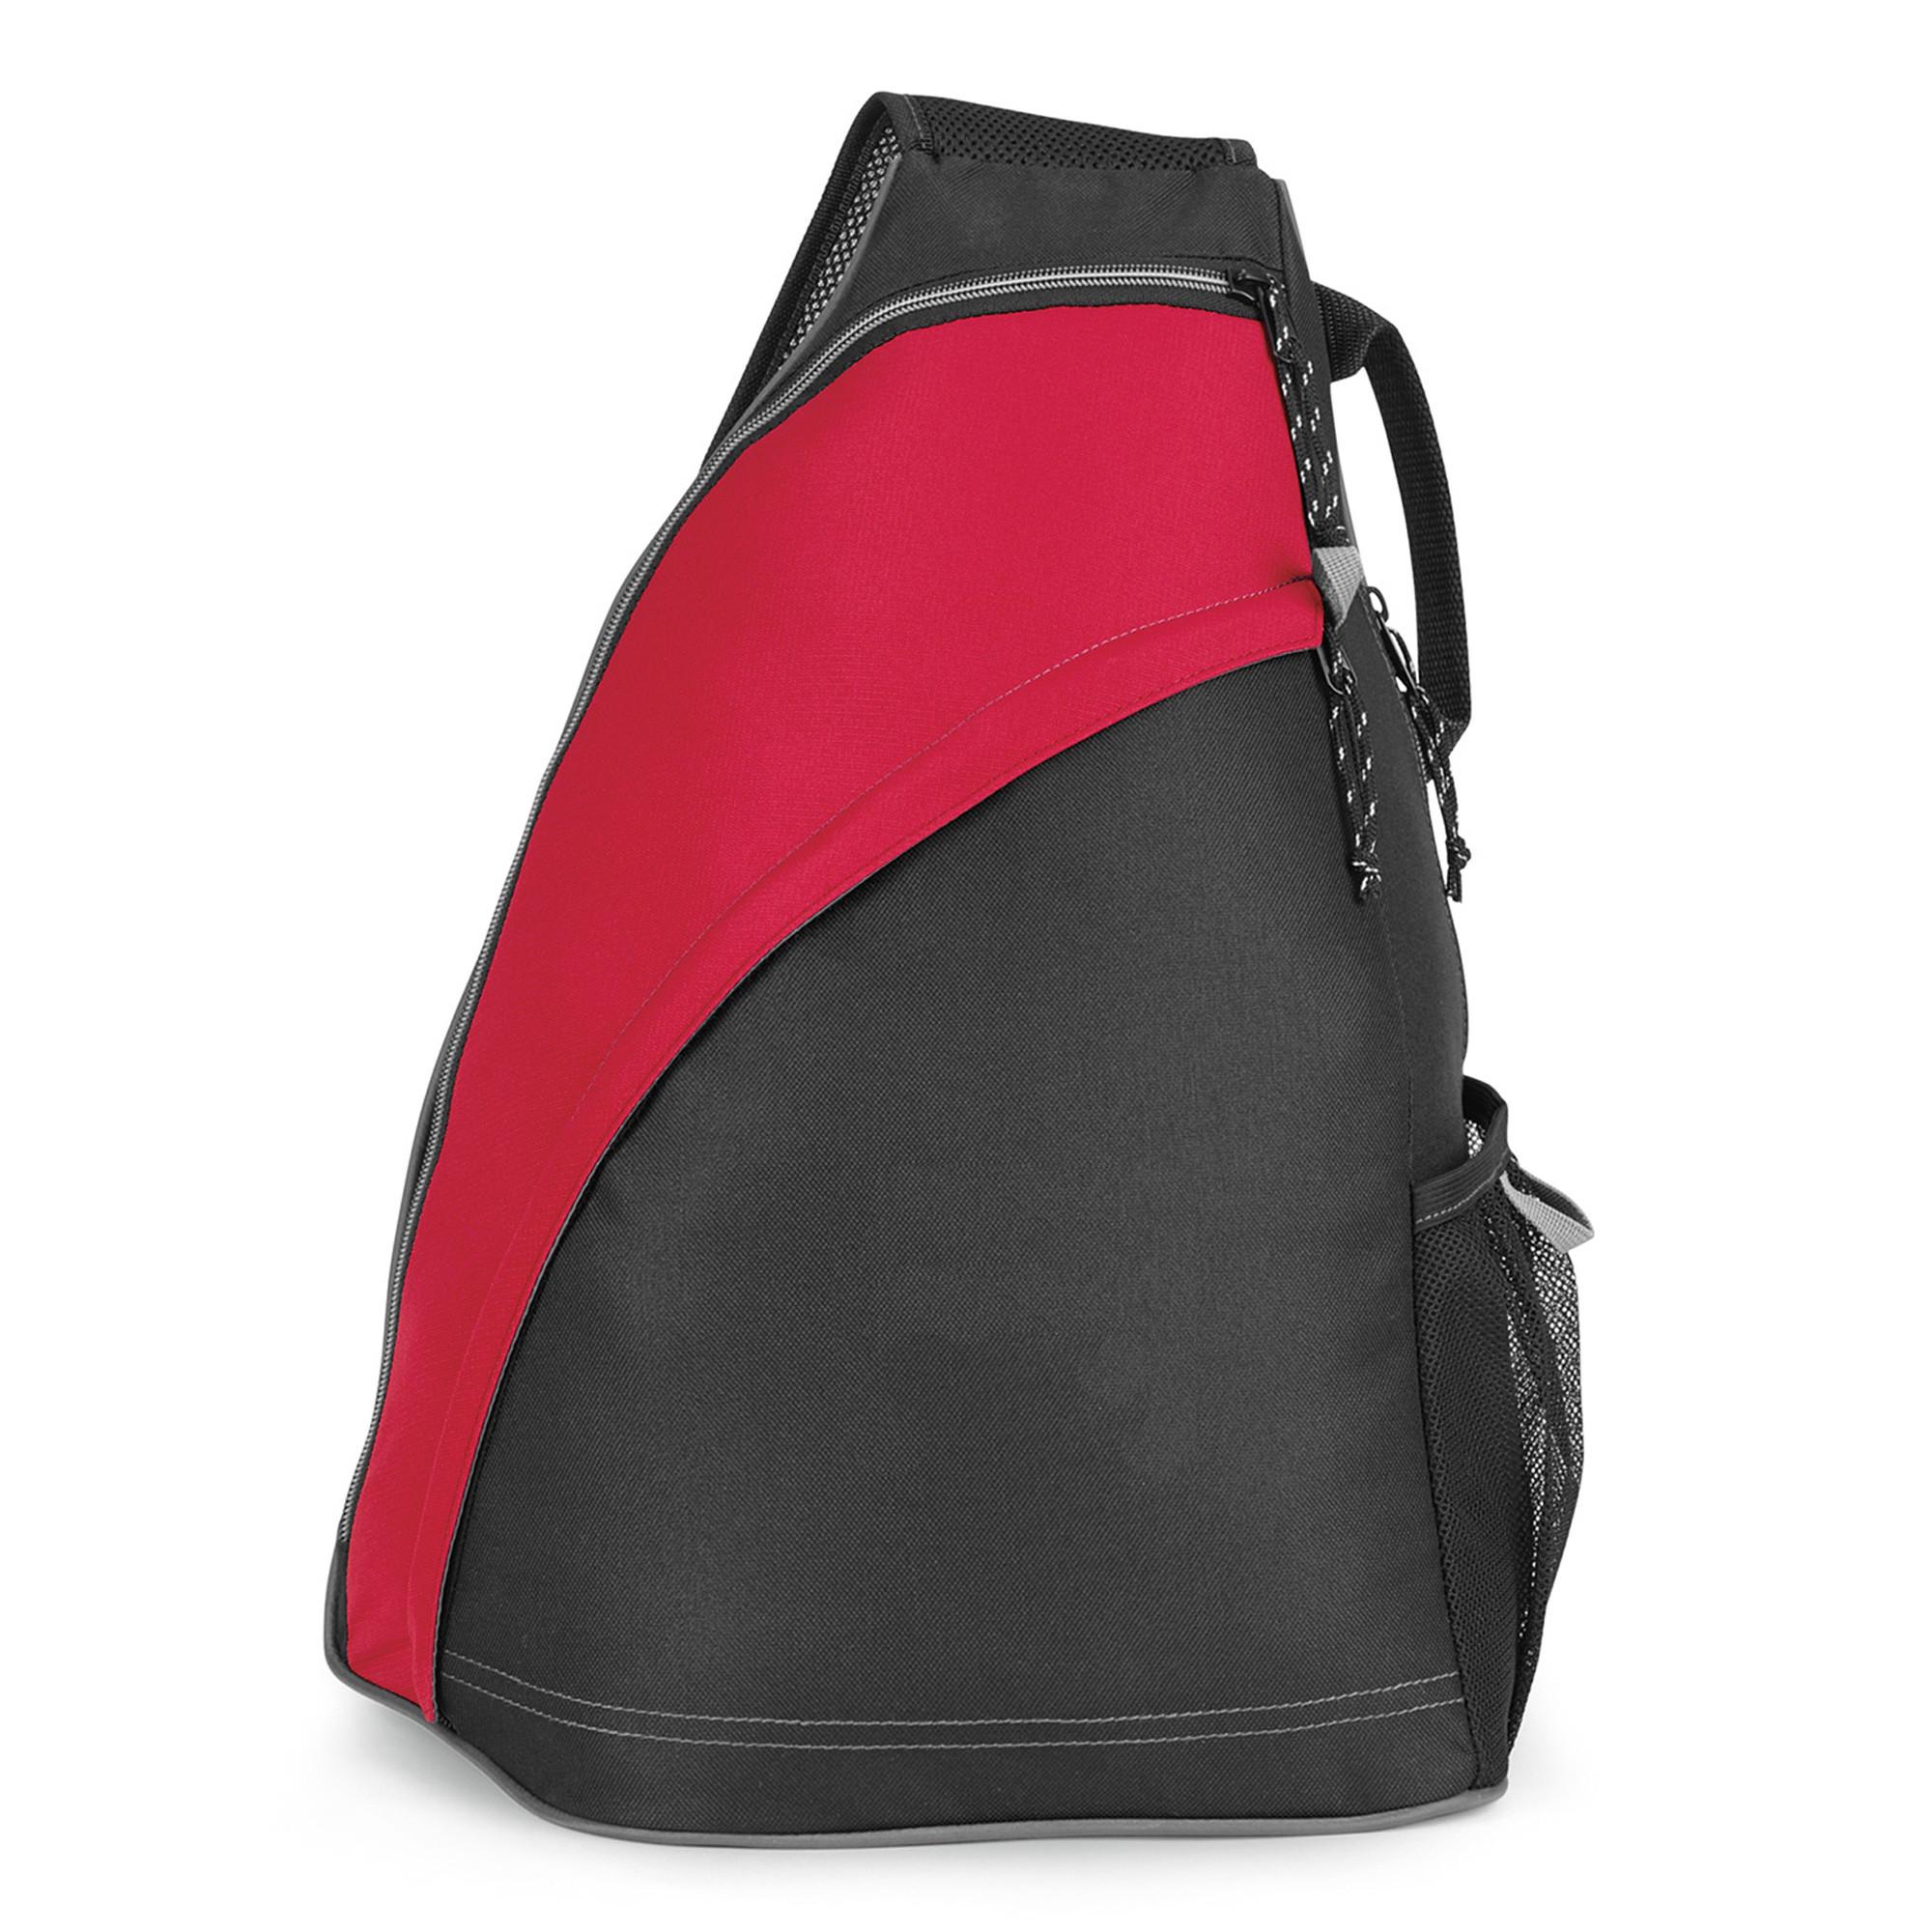 Gemline 5364 - Century Sling Bag